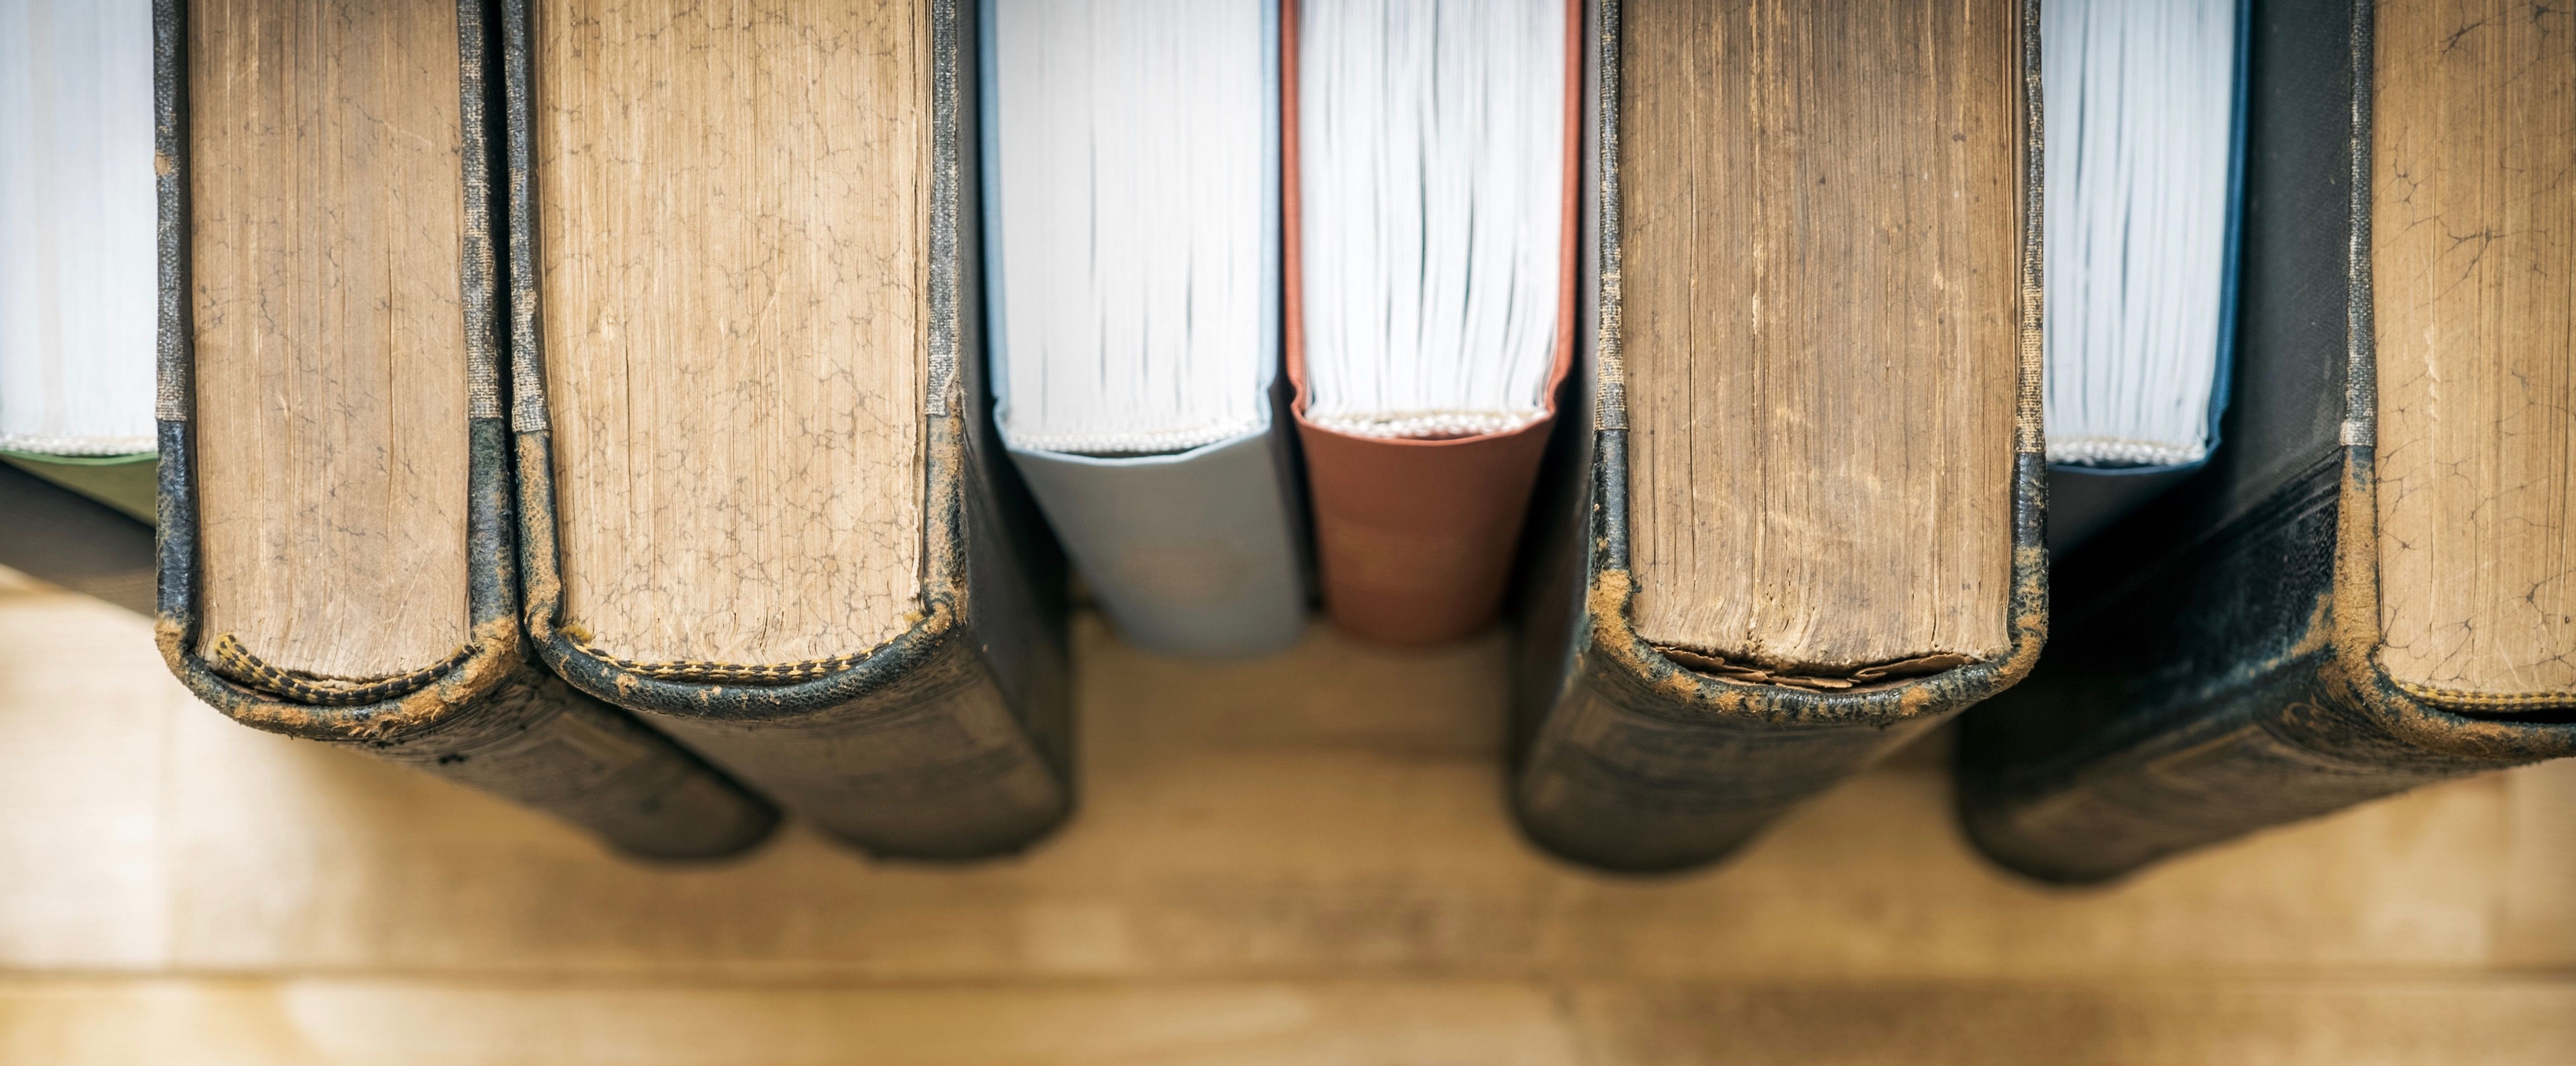 marketing-books-to-read-now-compressor.jpg  9 Marketing Books to Read Before Q1 Ends marketing books to read now compressor